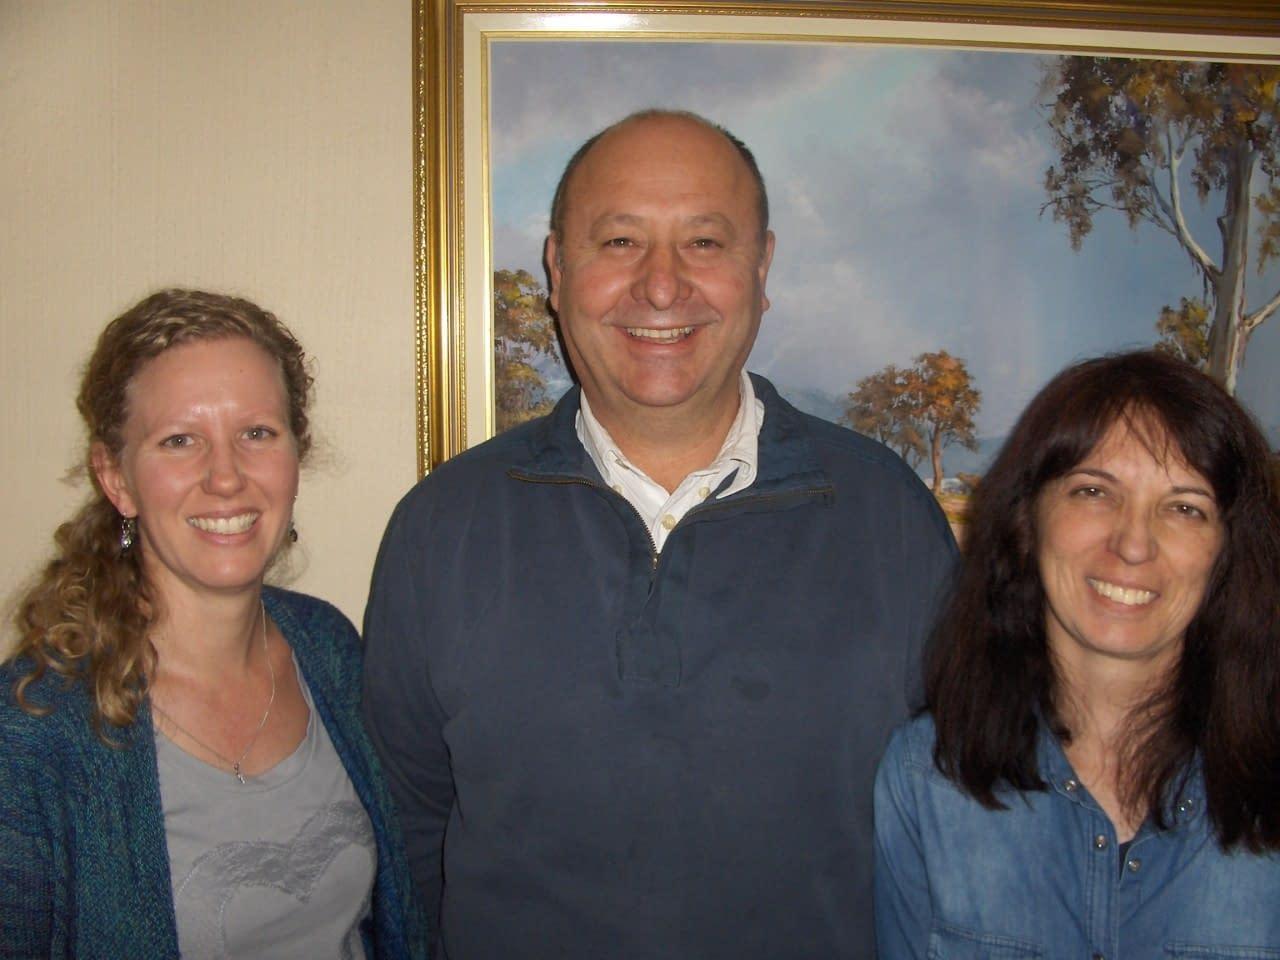 Jacqui, Conrad and Angela (L to R)-SEO Training Course – Search Engine Optimization